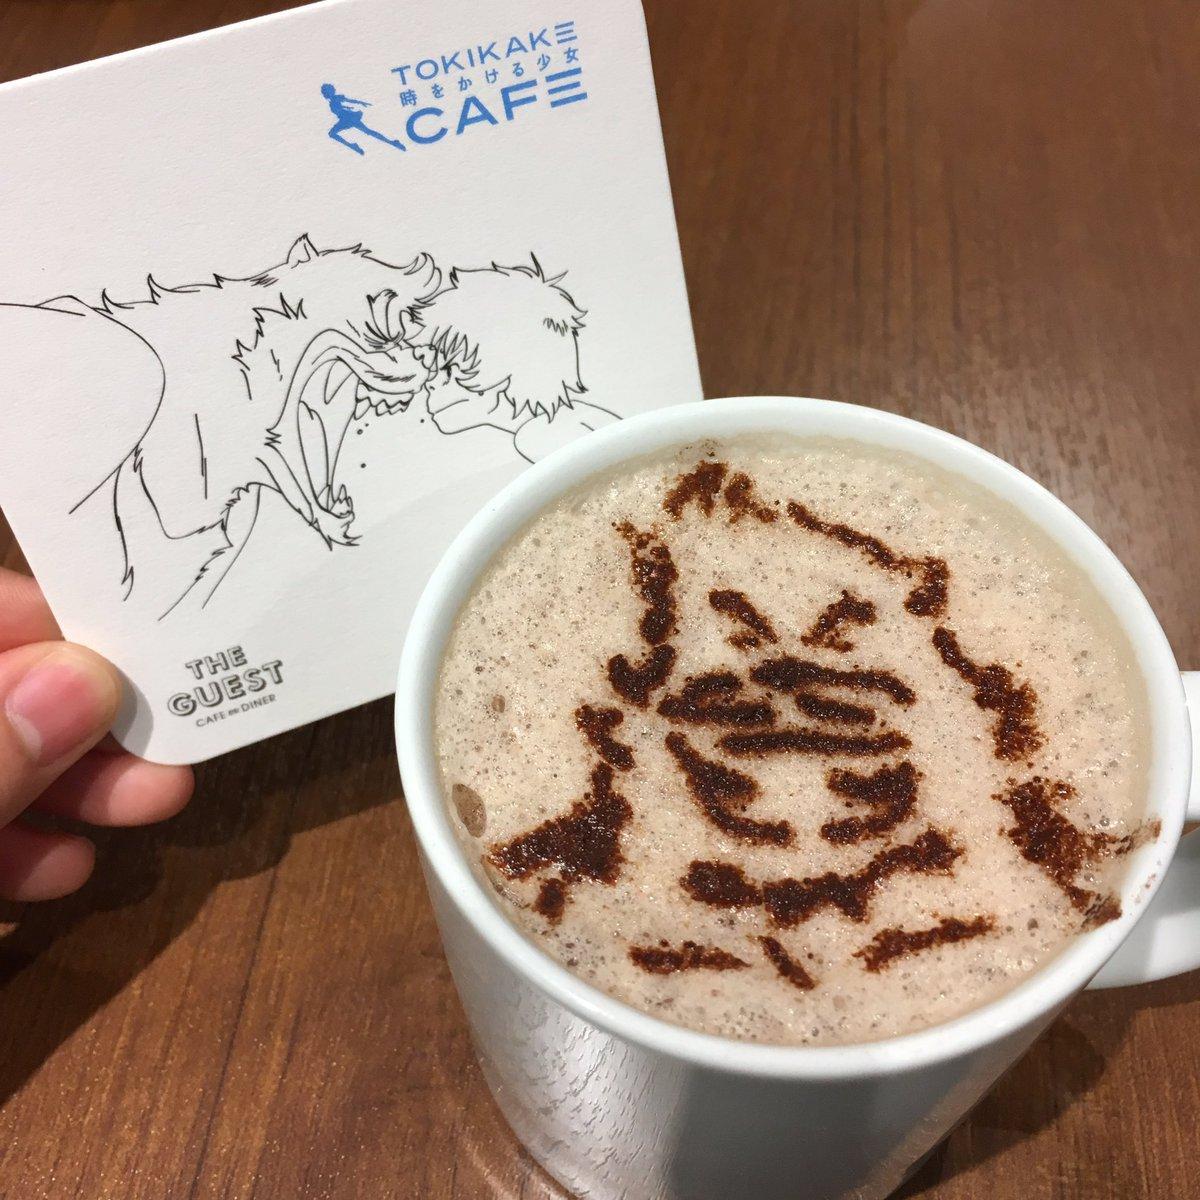 TOKIKAKE CAFE行ったらバケモノの子のメニューあって熊徹注文🐻